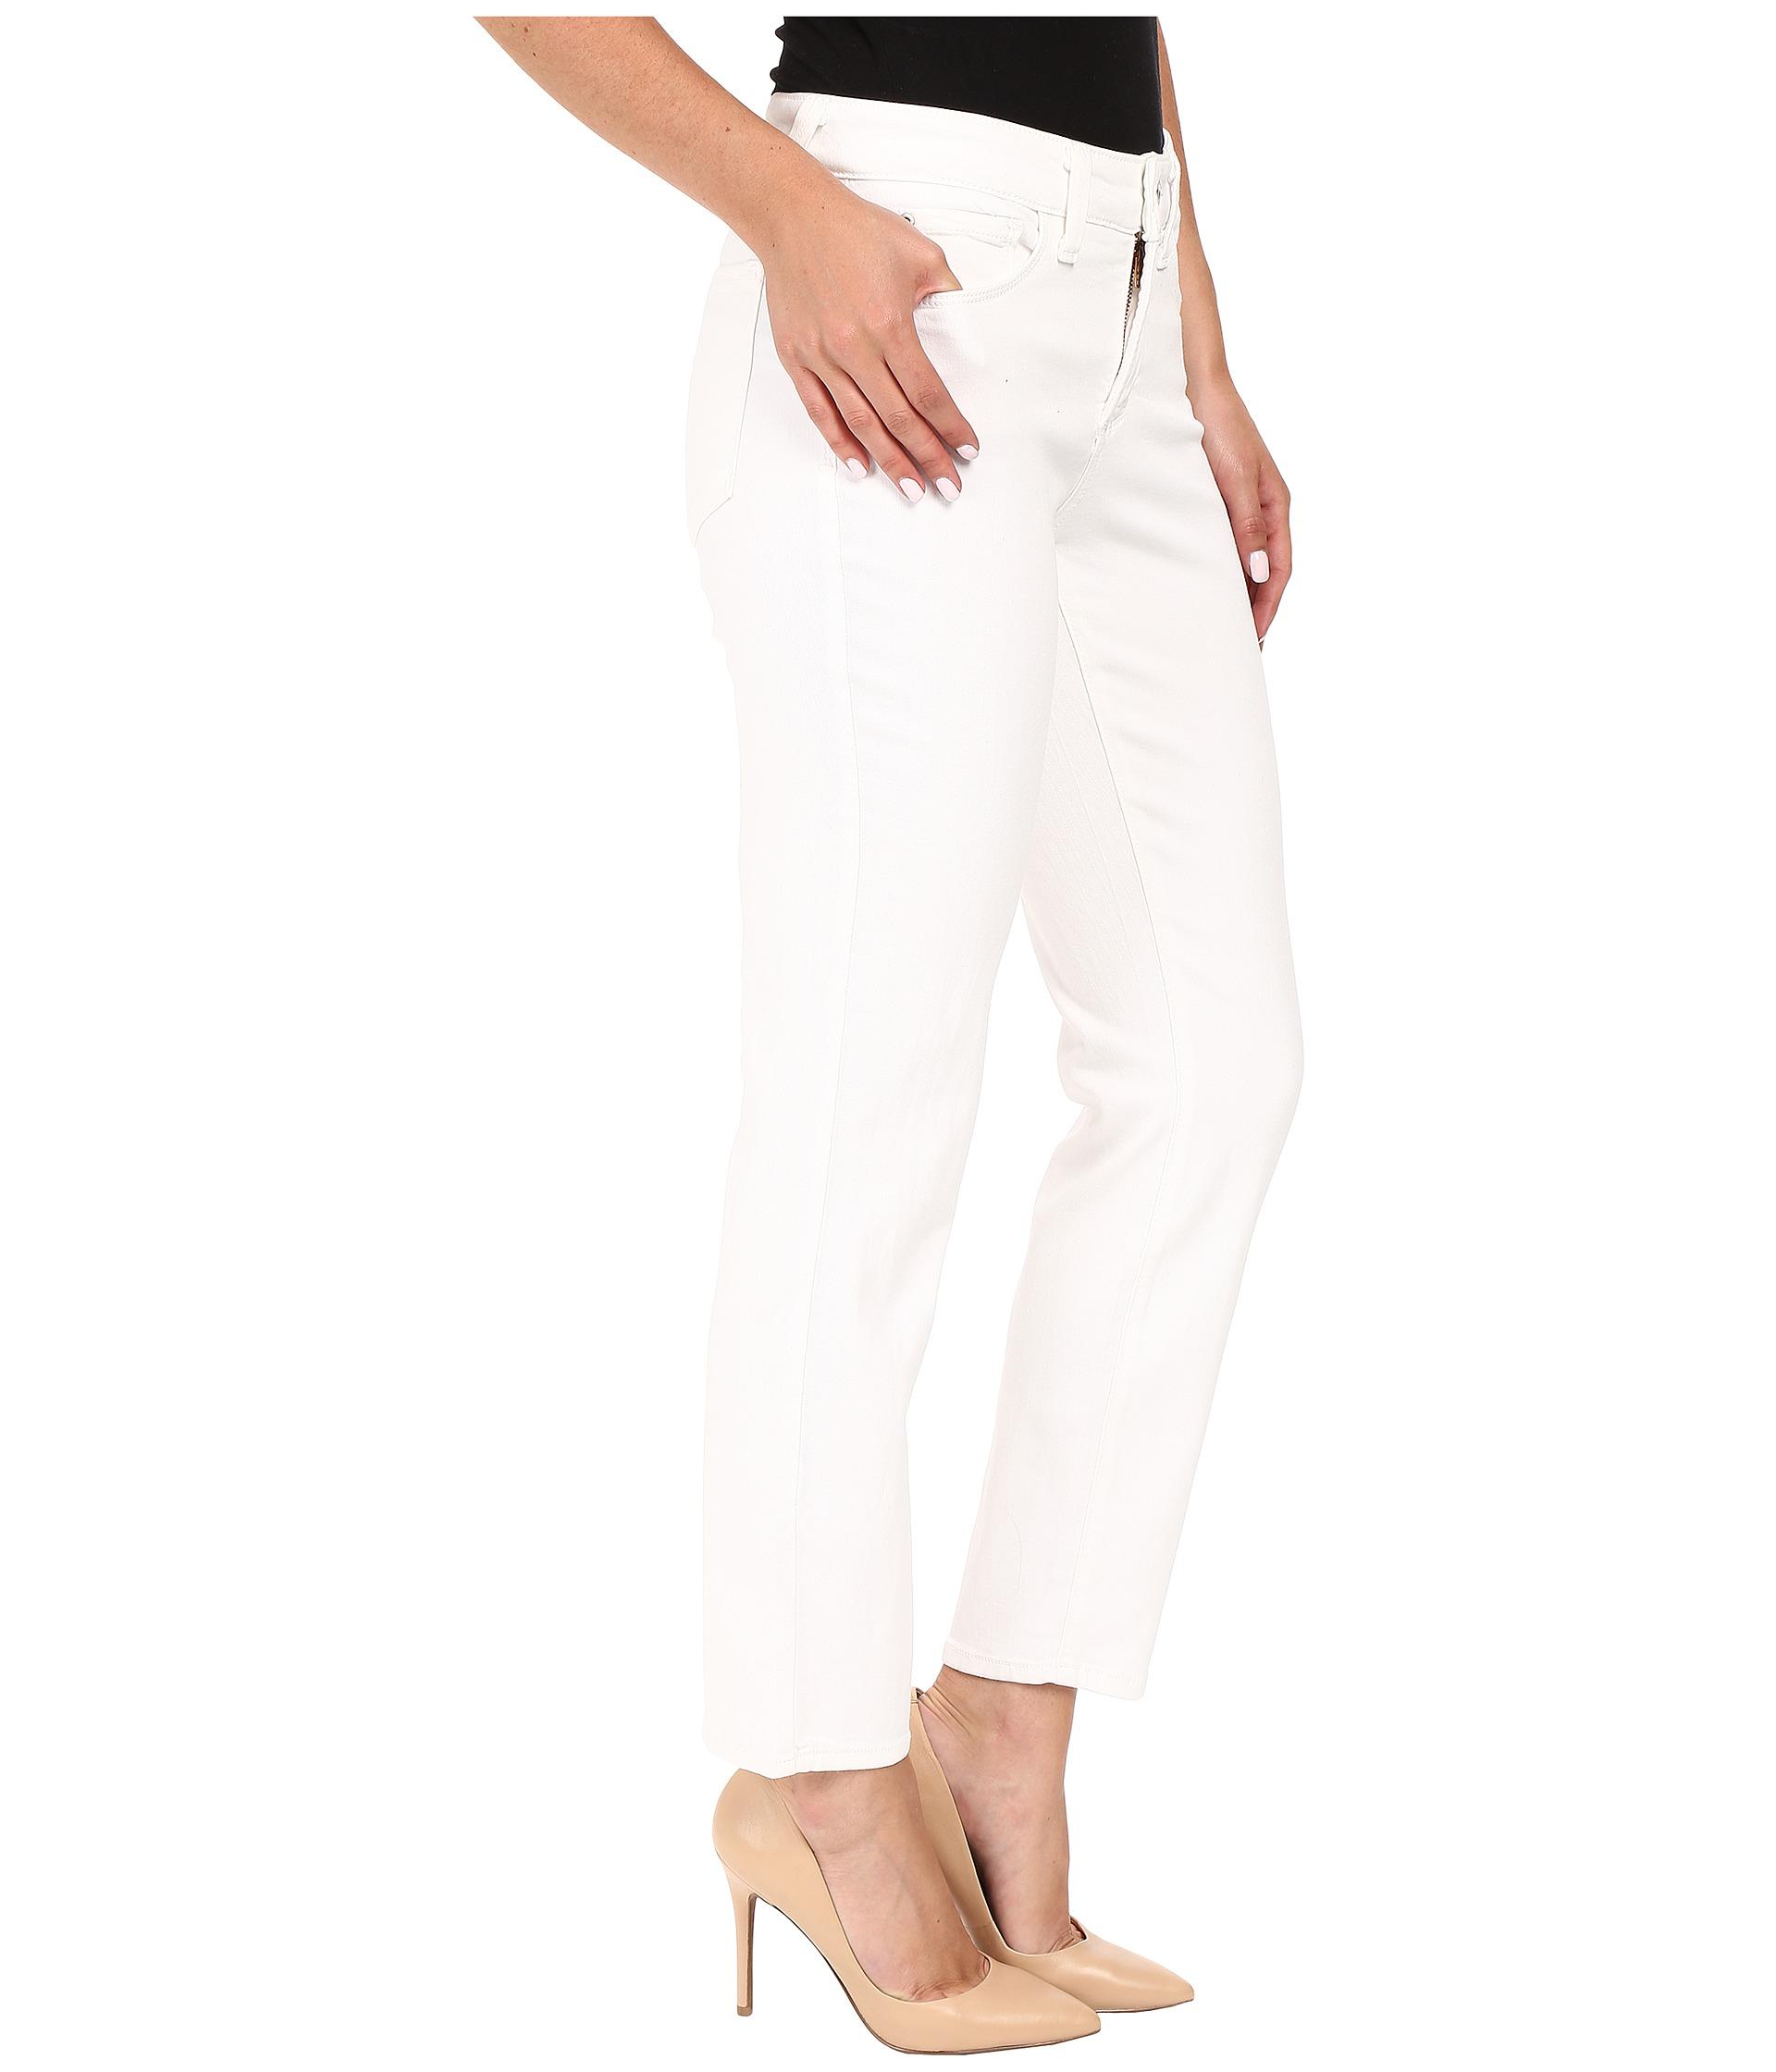 NYDJ Clarissa Ankle Optic White Zapposcom Free Shipping